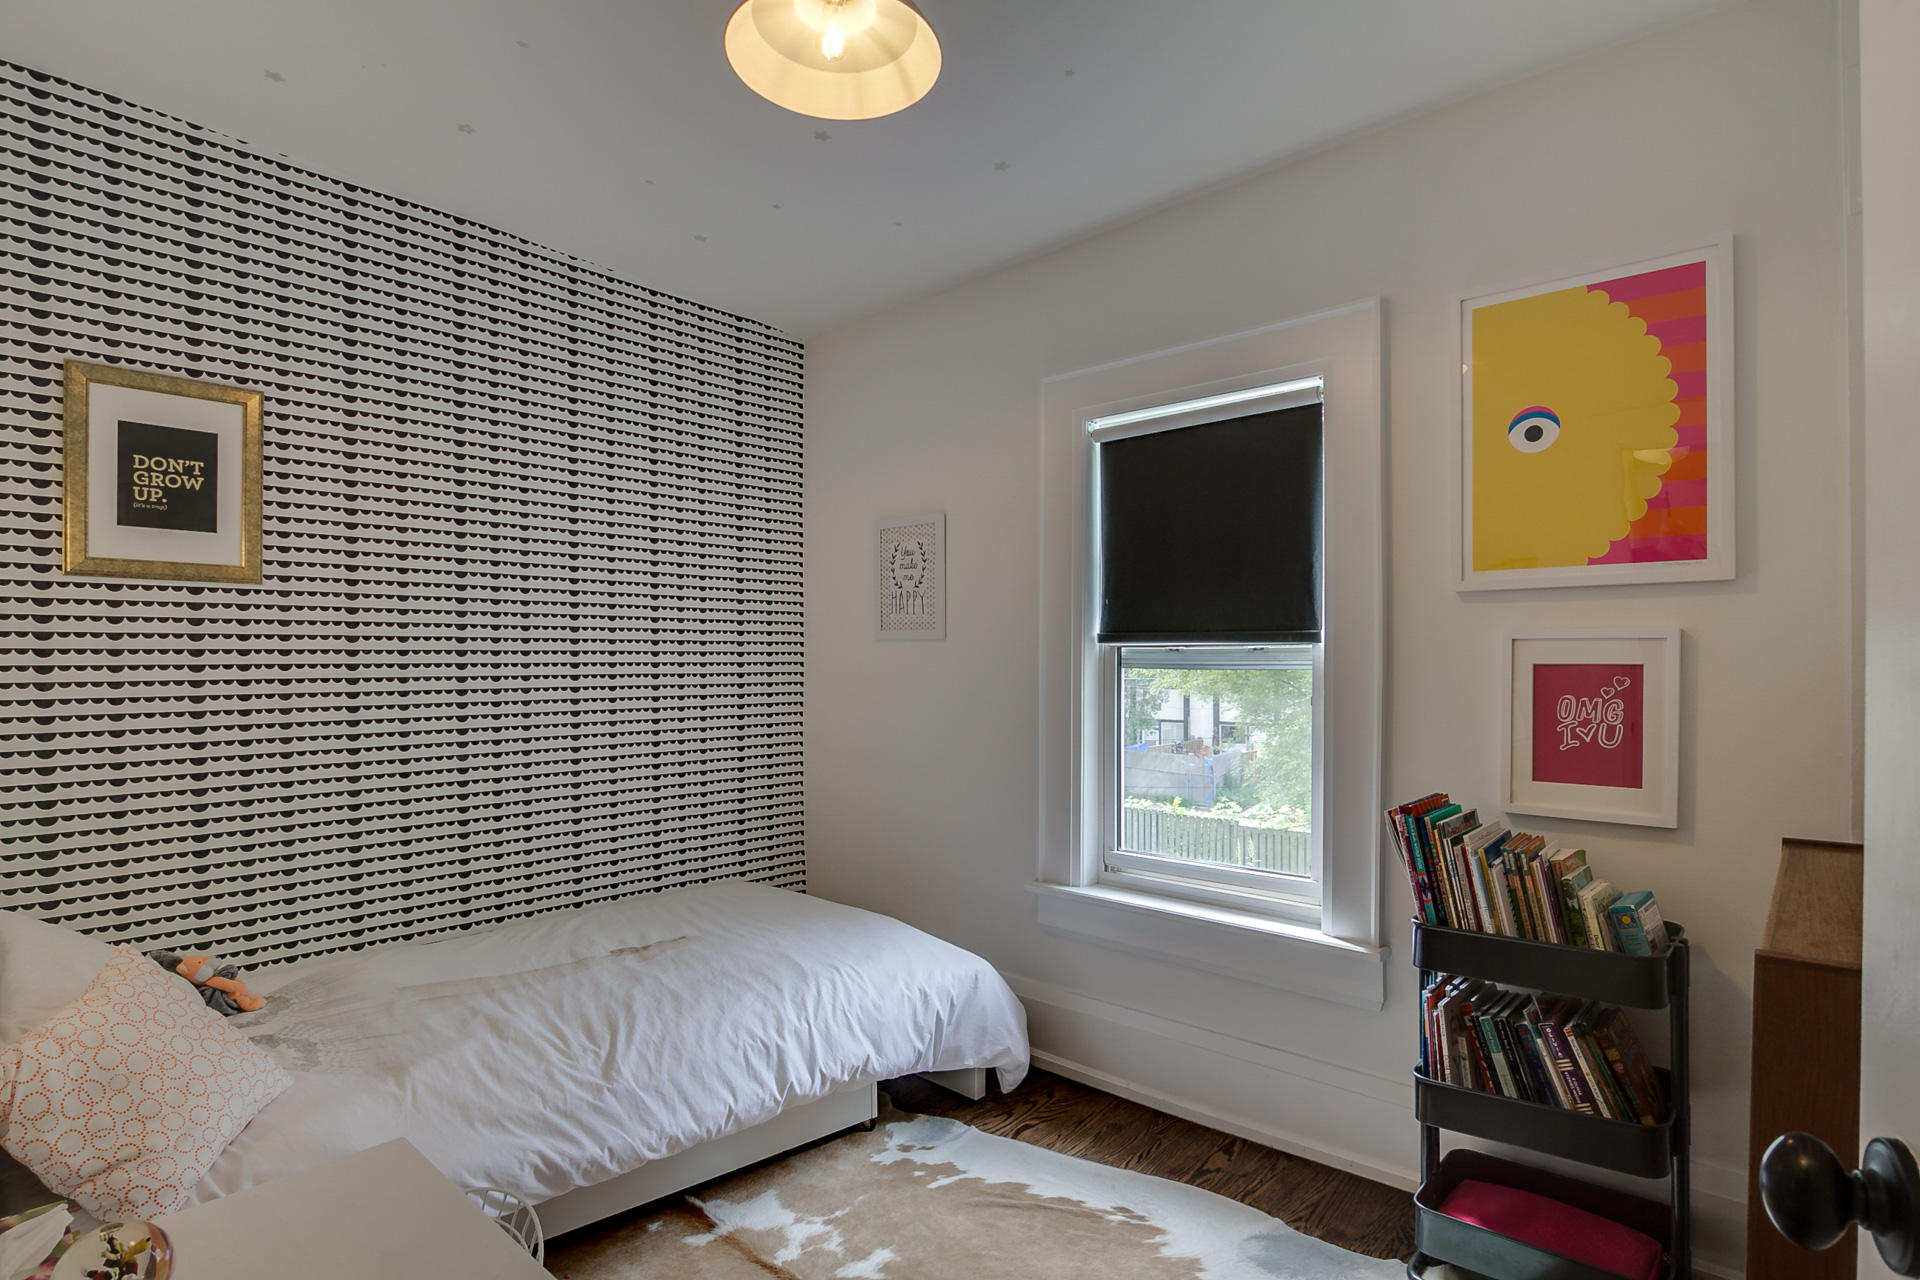 35_fourth_bedroom1.jpg